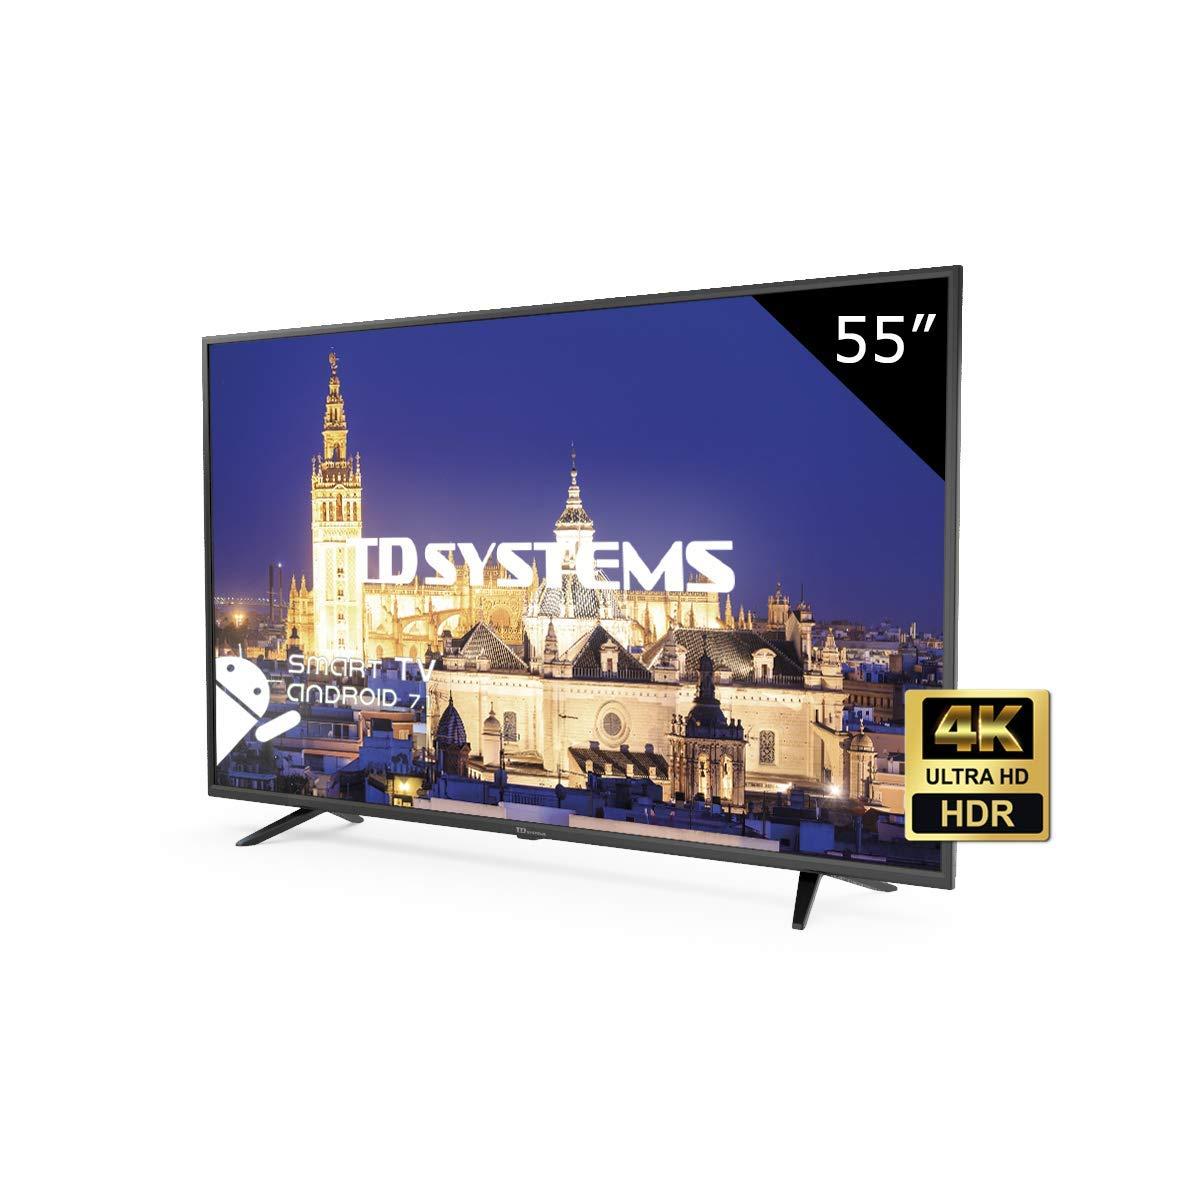 Las 10 mejores TV por menos de 500 euros (Actualizado febrero 2020) 4 tv por menos de 500 euros